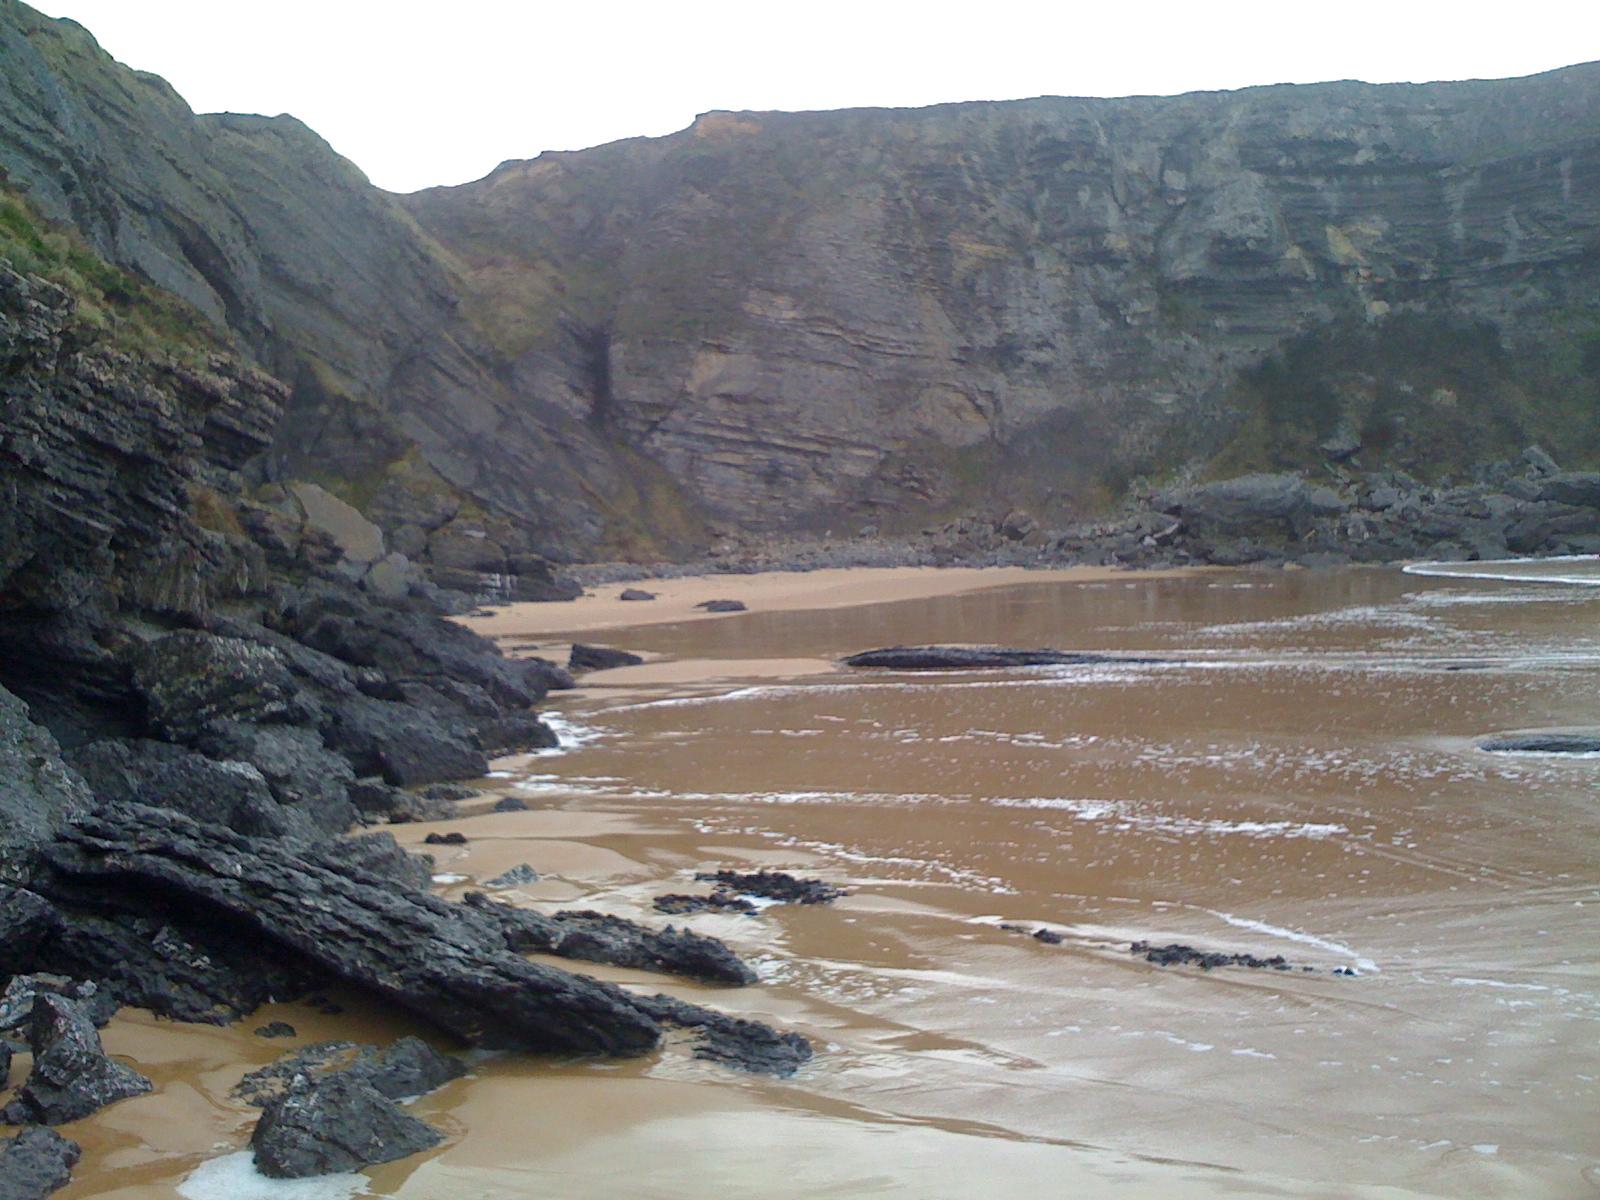 Playa Antuerta